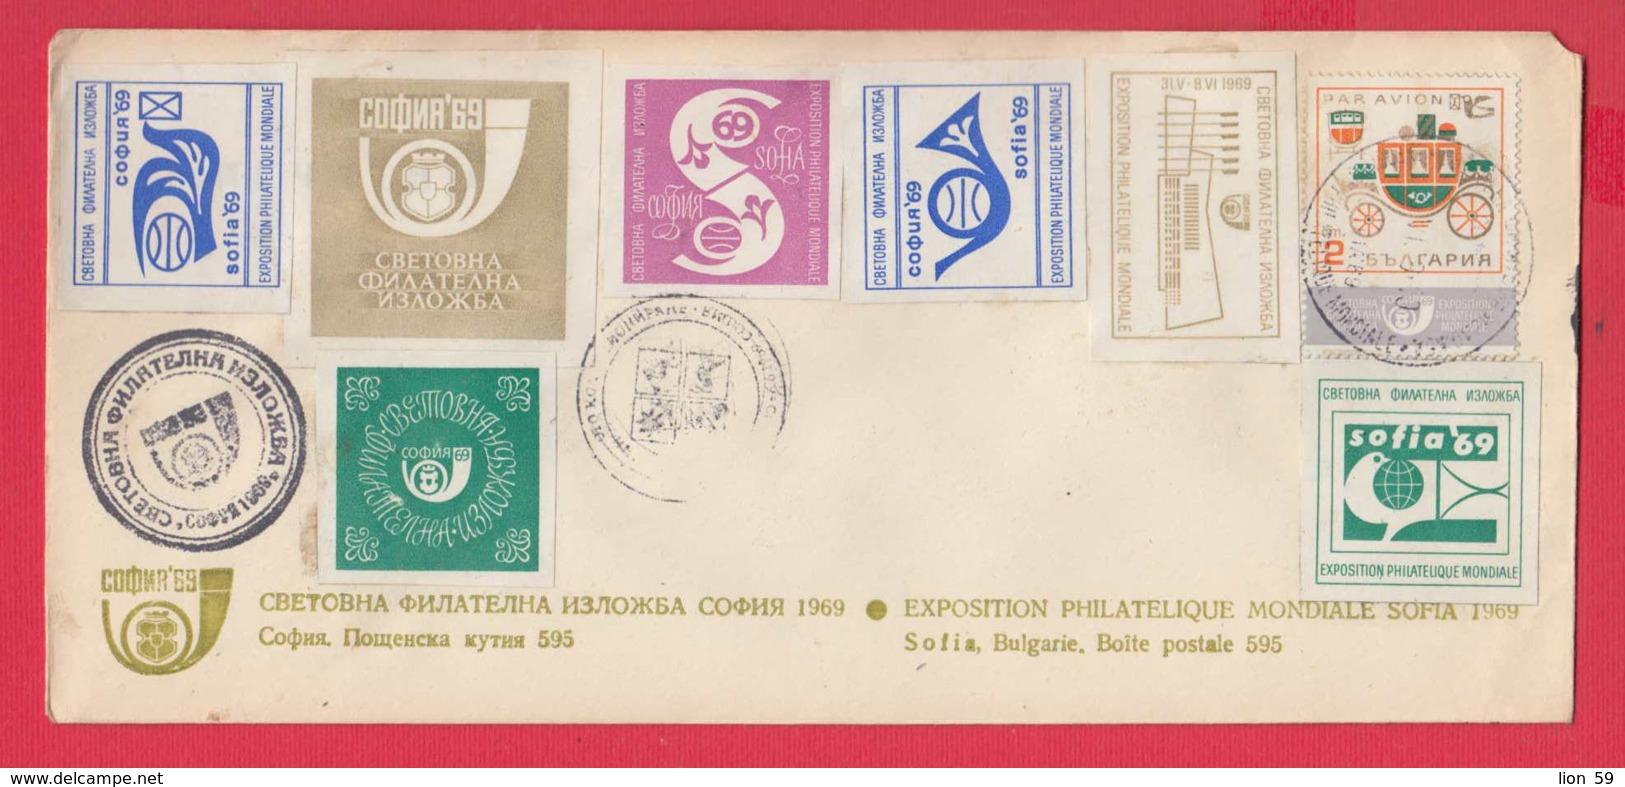 242707 / Bulgaria 1969 CINDERELLA LABEL VIGNETTE World Philatelic Exhibition SOFIA 69 , BIRD DOVE , SHIP , Bulgarie - Cinderellas